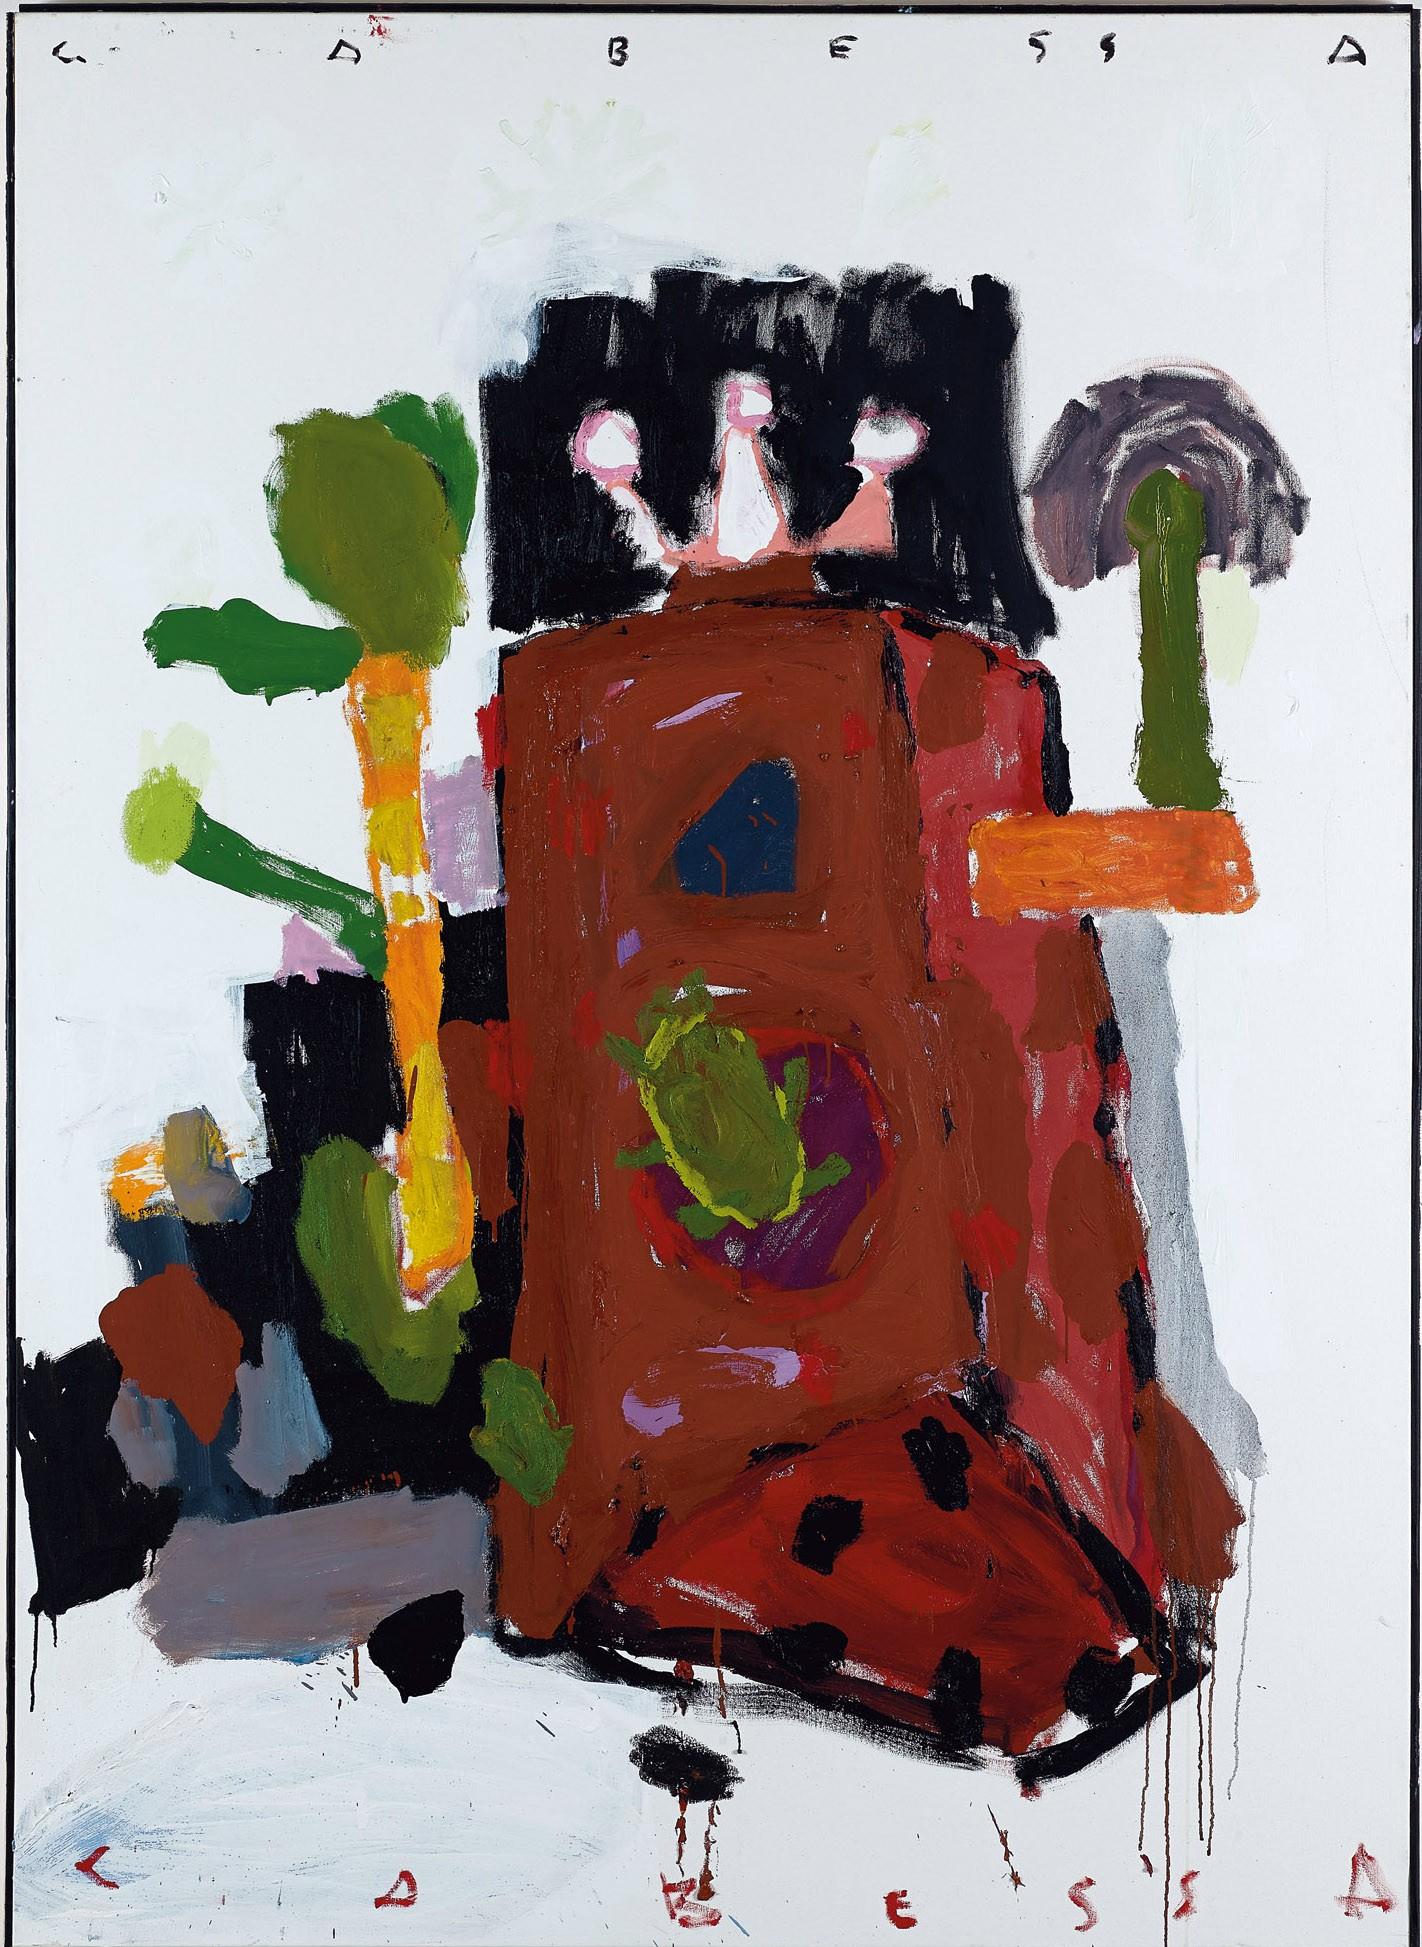 Amit Cabessa, 2018, Oil on canvas, 180x130 cm